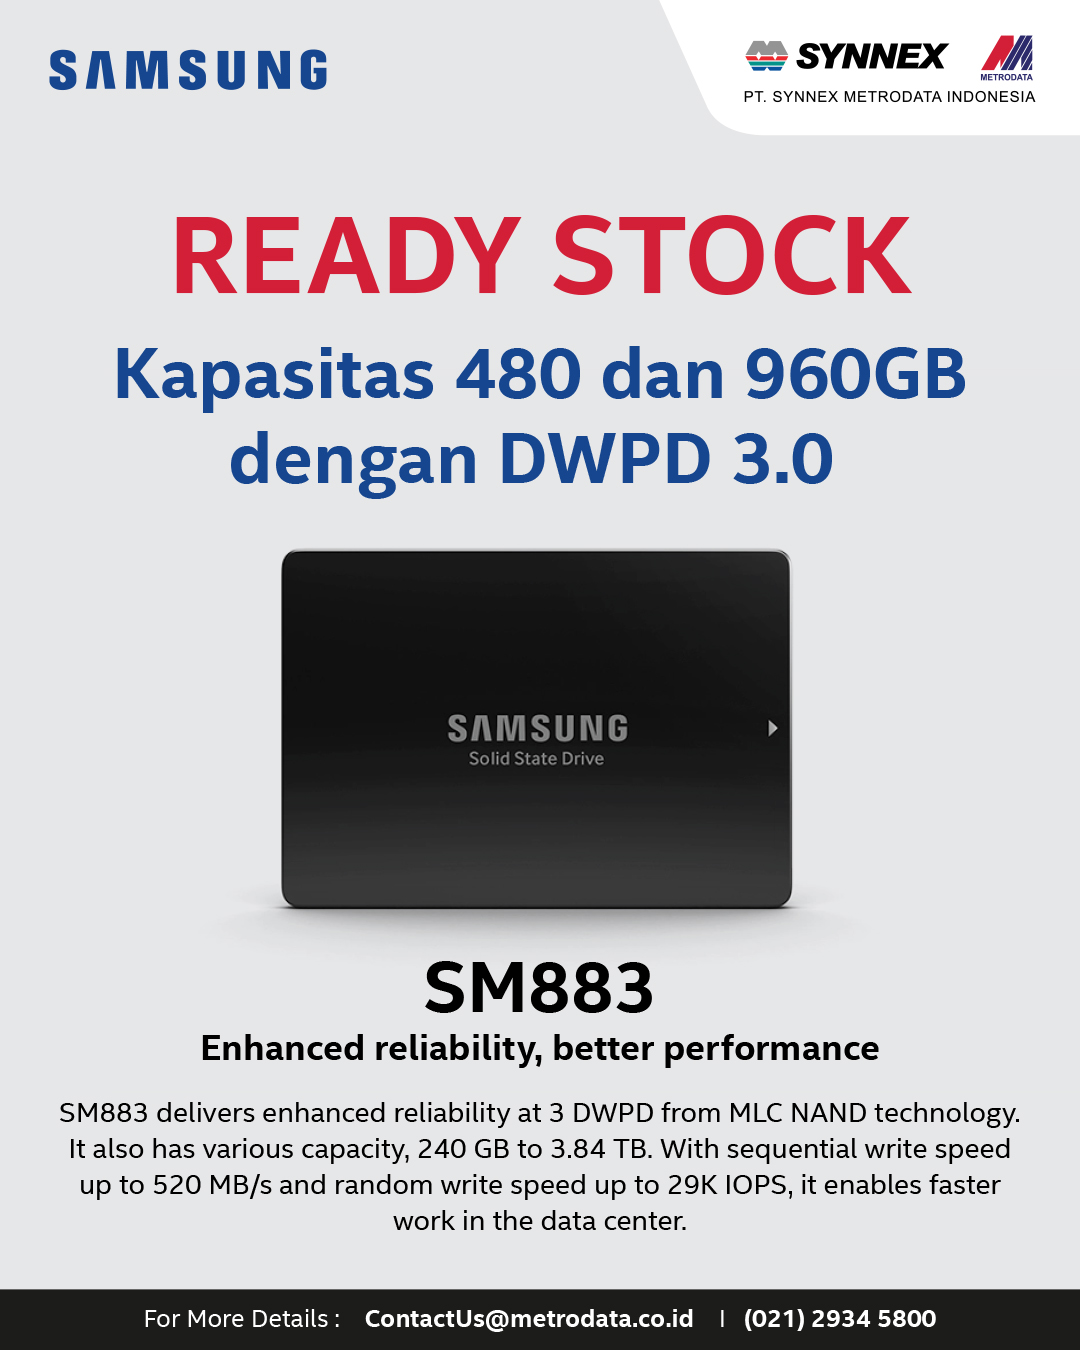 https://www.synnexmetrodata.com/wp-content/uploads/2021/09/EDM-Samsung-SM883.jpg